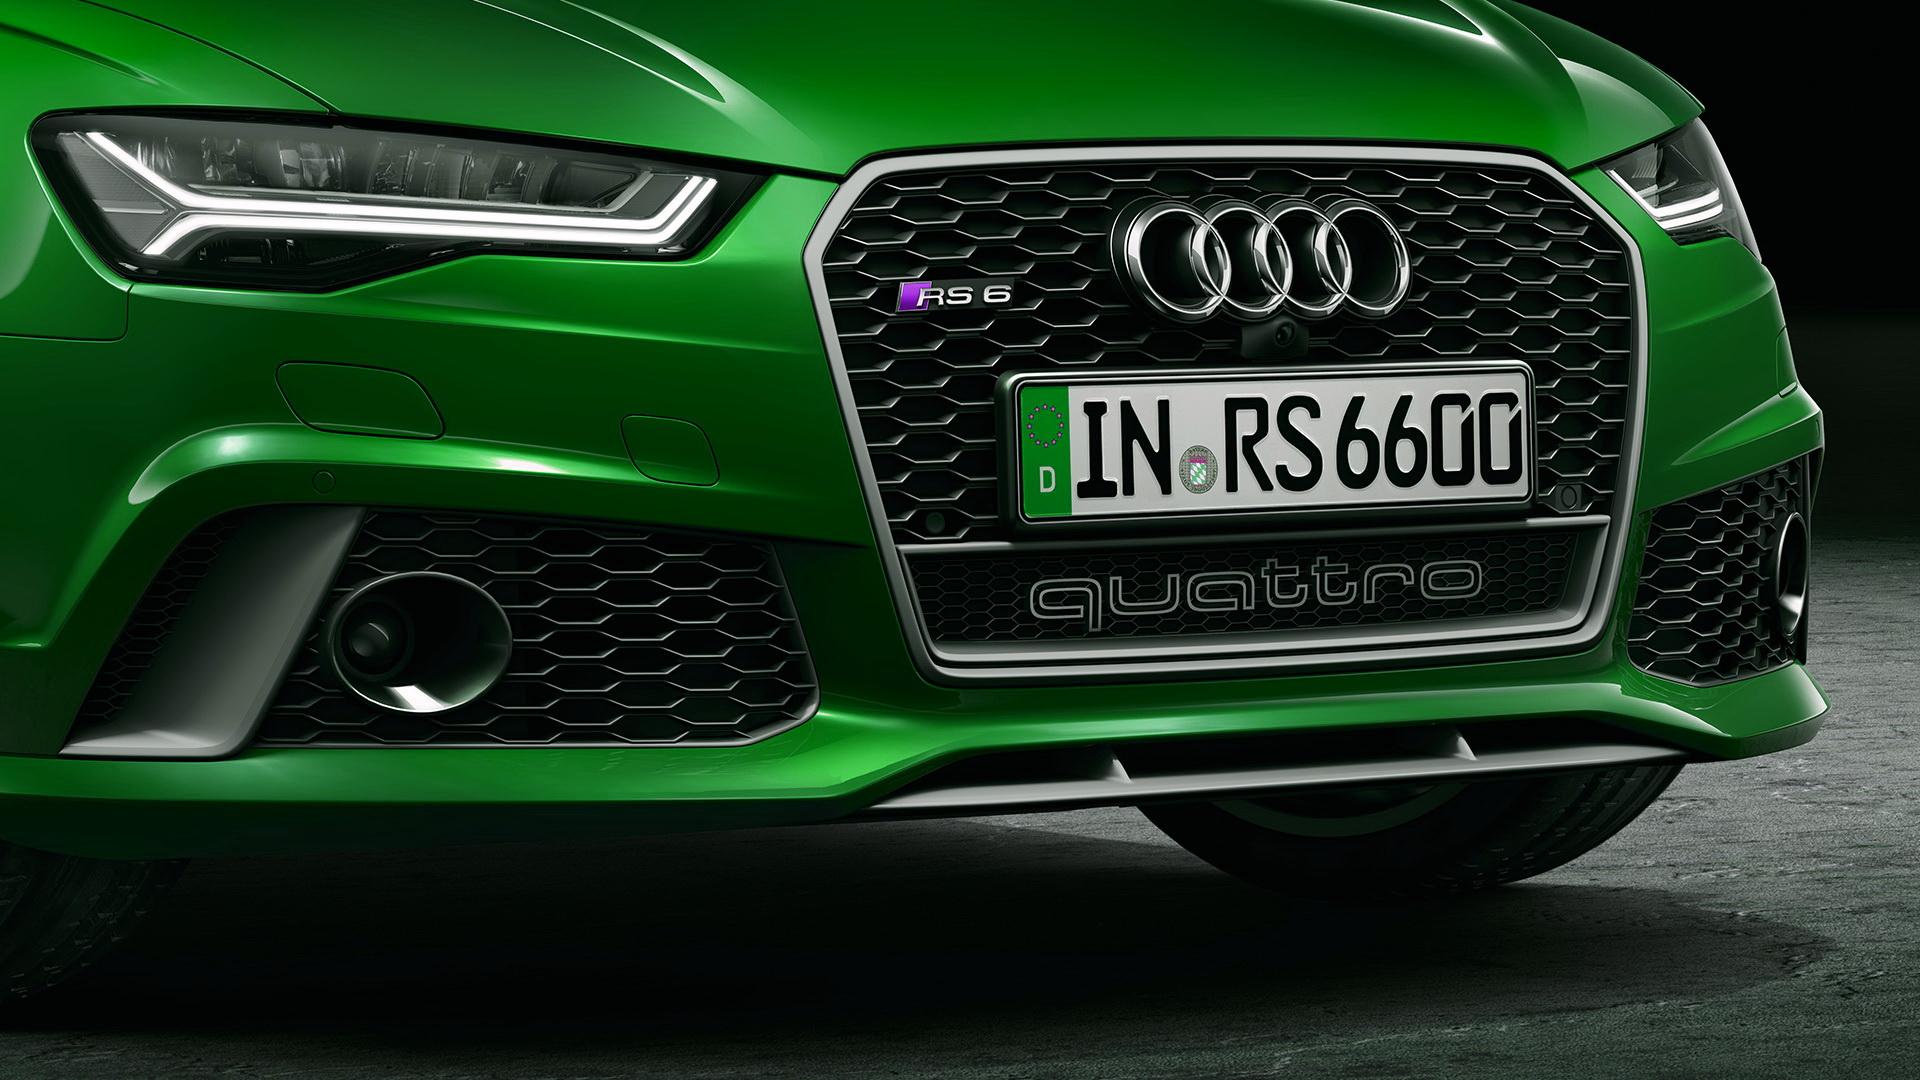 05 Gruen Neuer Audi Rs6 Bilder Thread Audi A6 4g